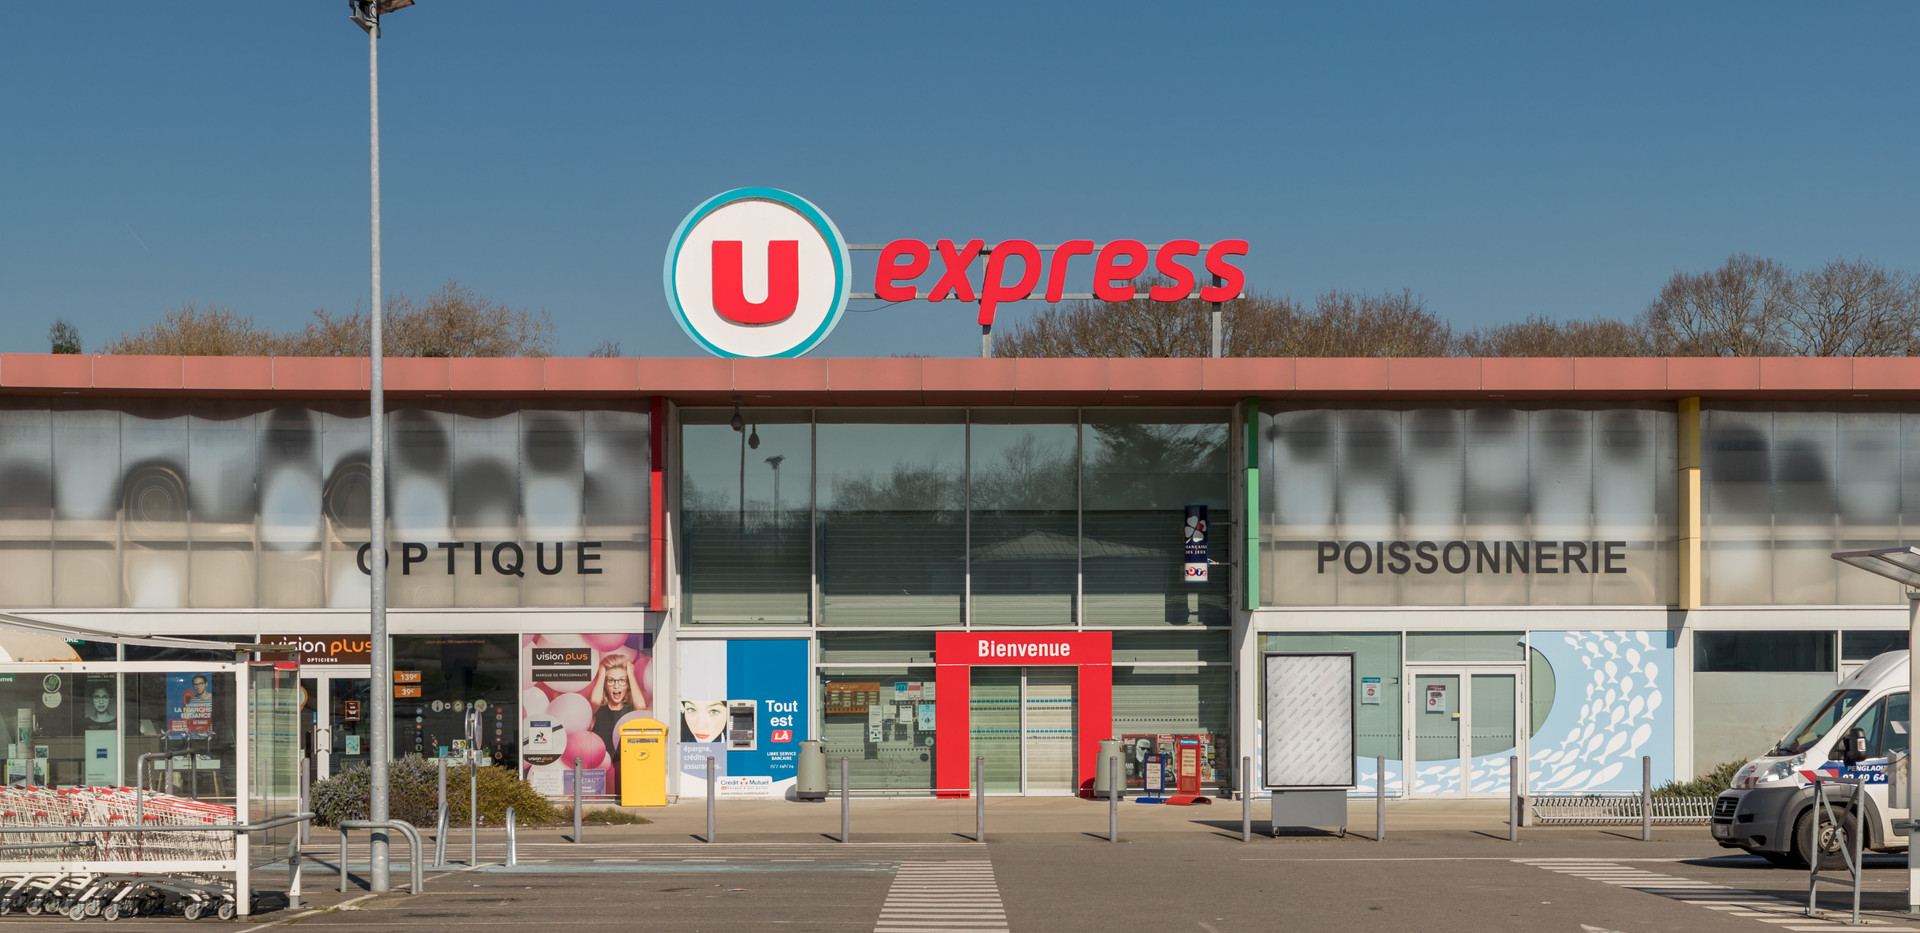 U Express Saint Pere en retz-2comp.jpg